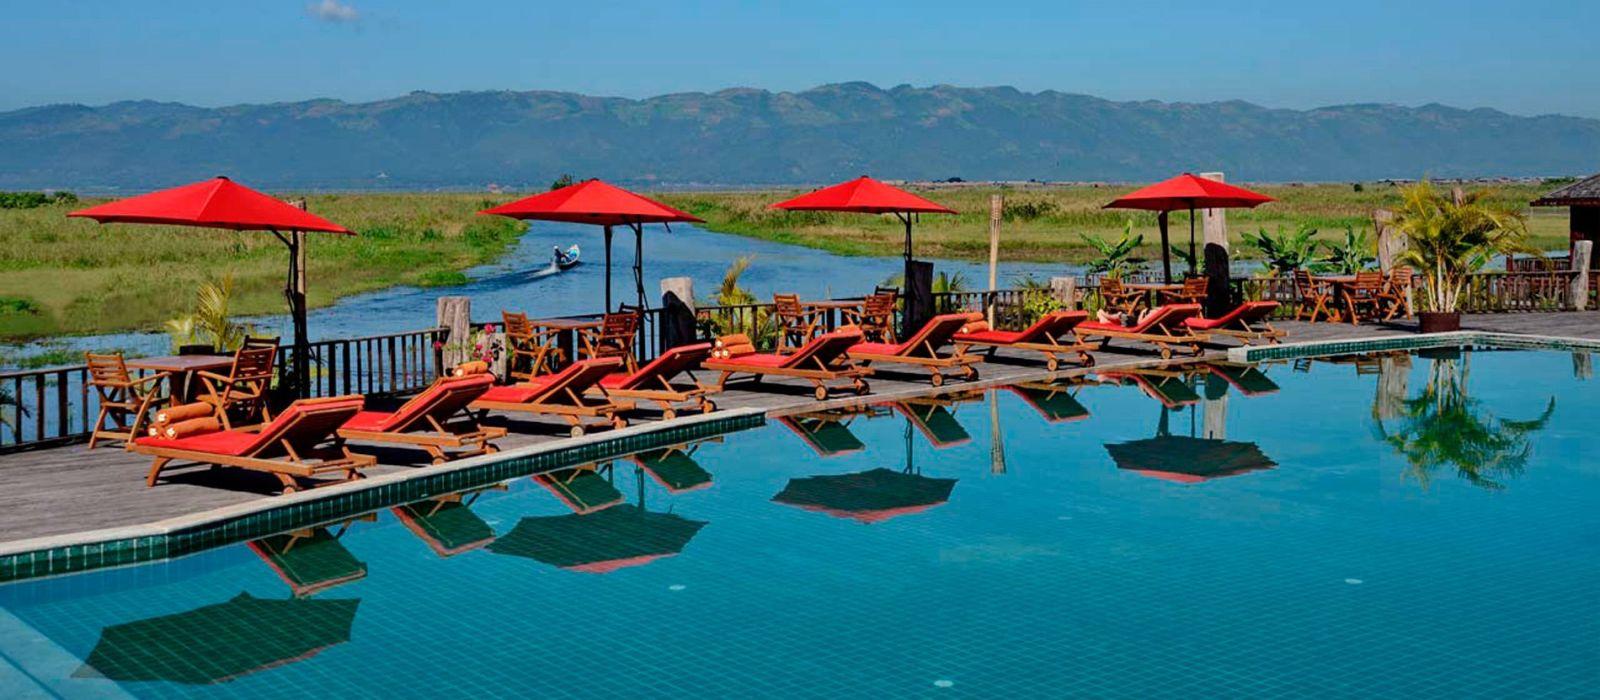 Aureum Palace Resort Spa Inle